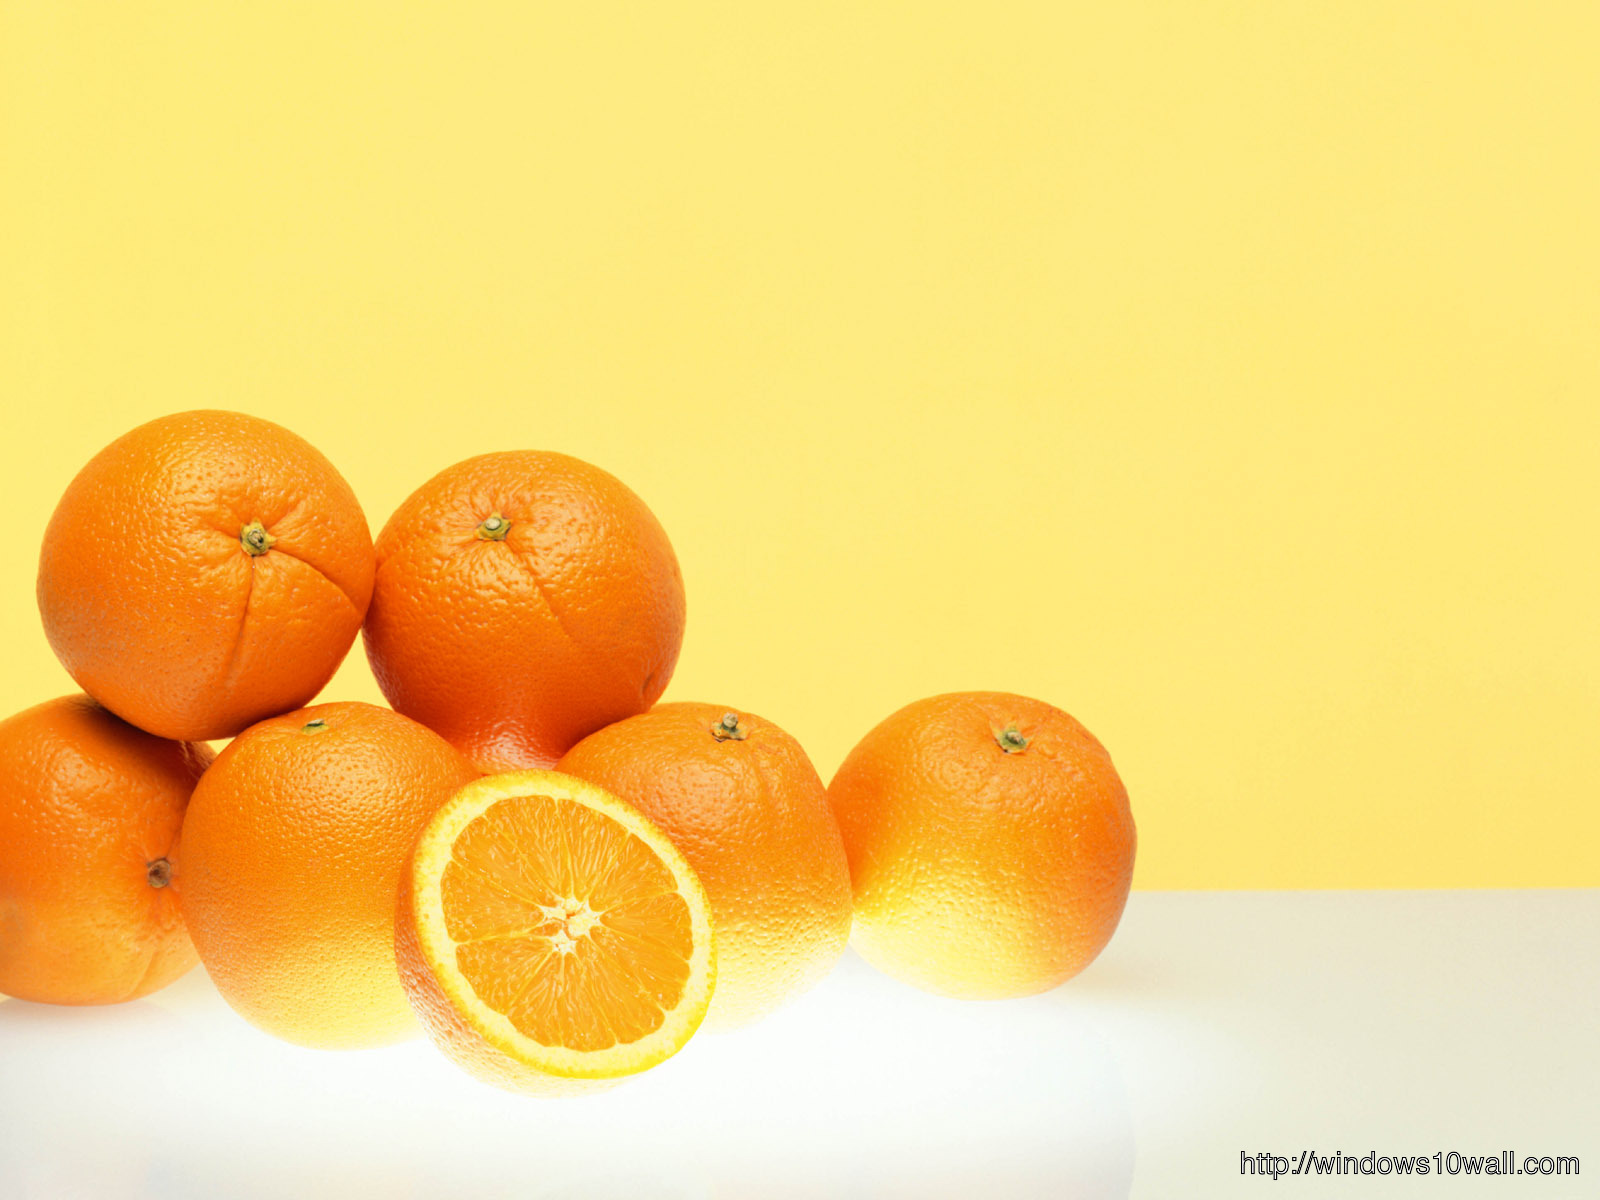 High Quality Orange Wallpaper: Windows 10 Wallpapers